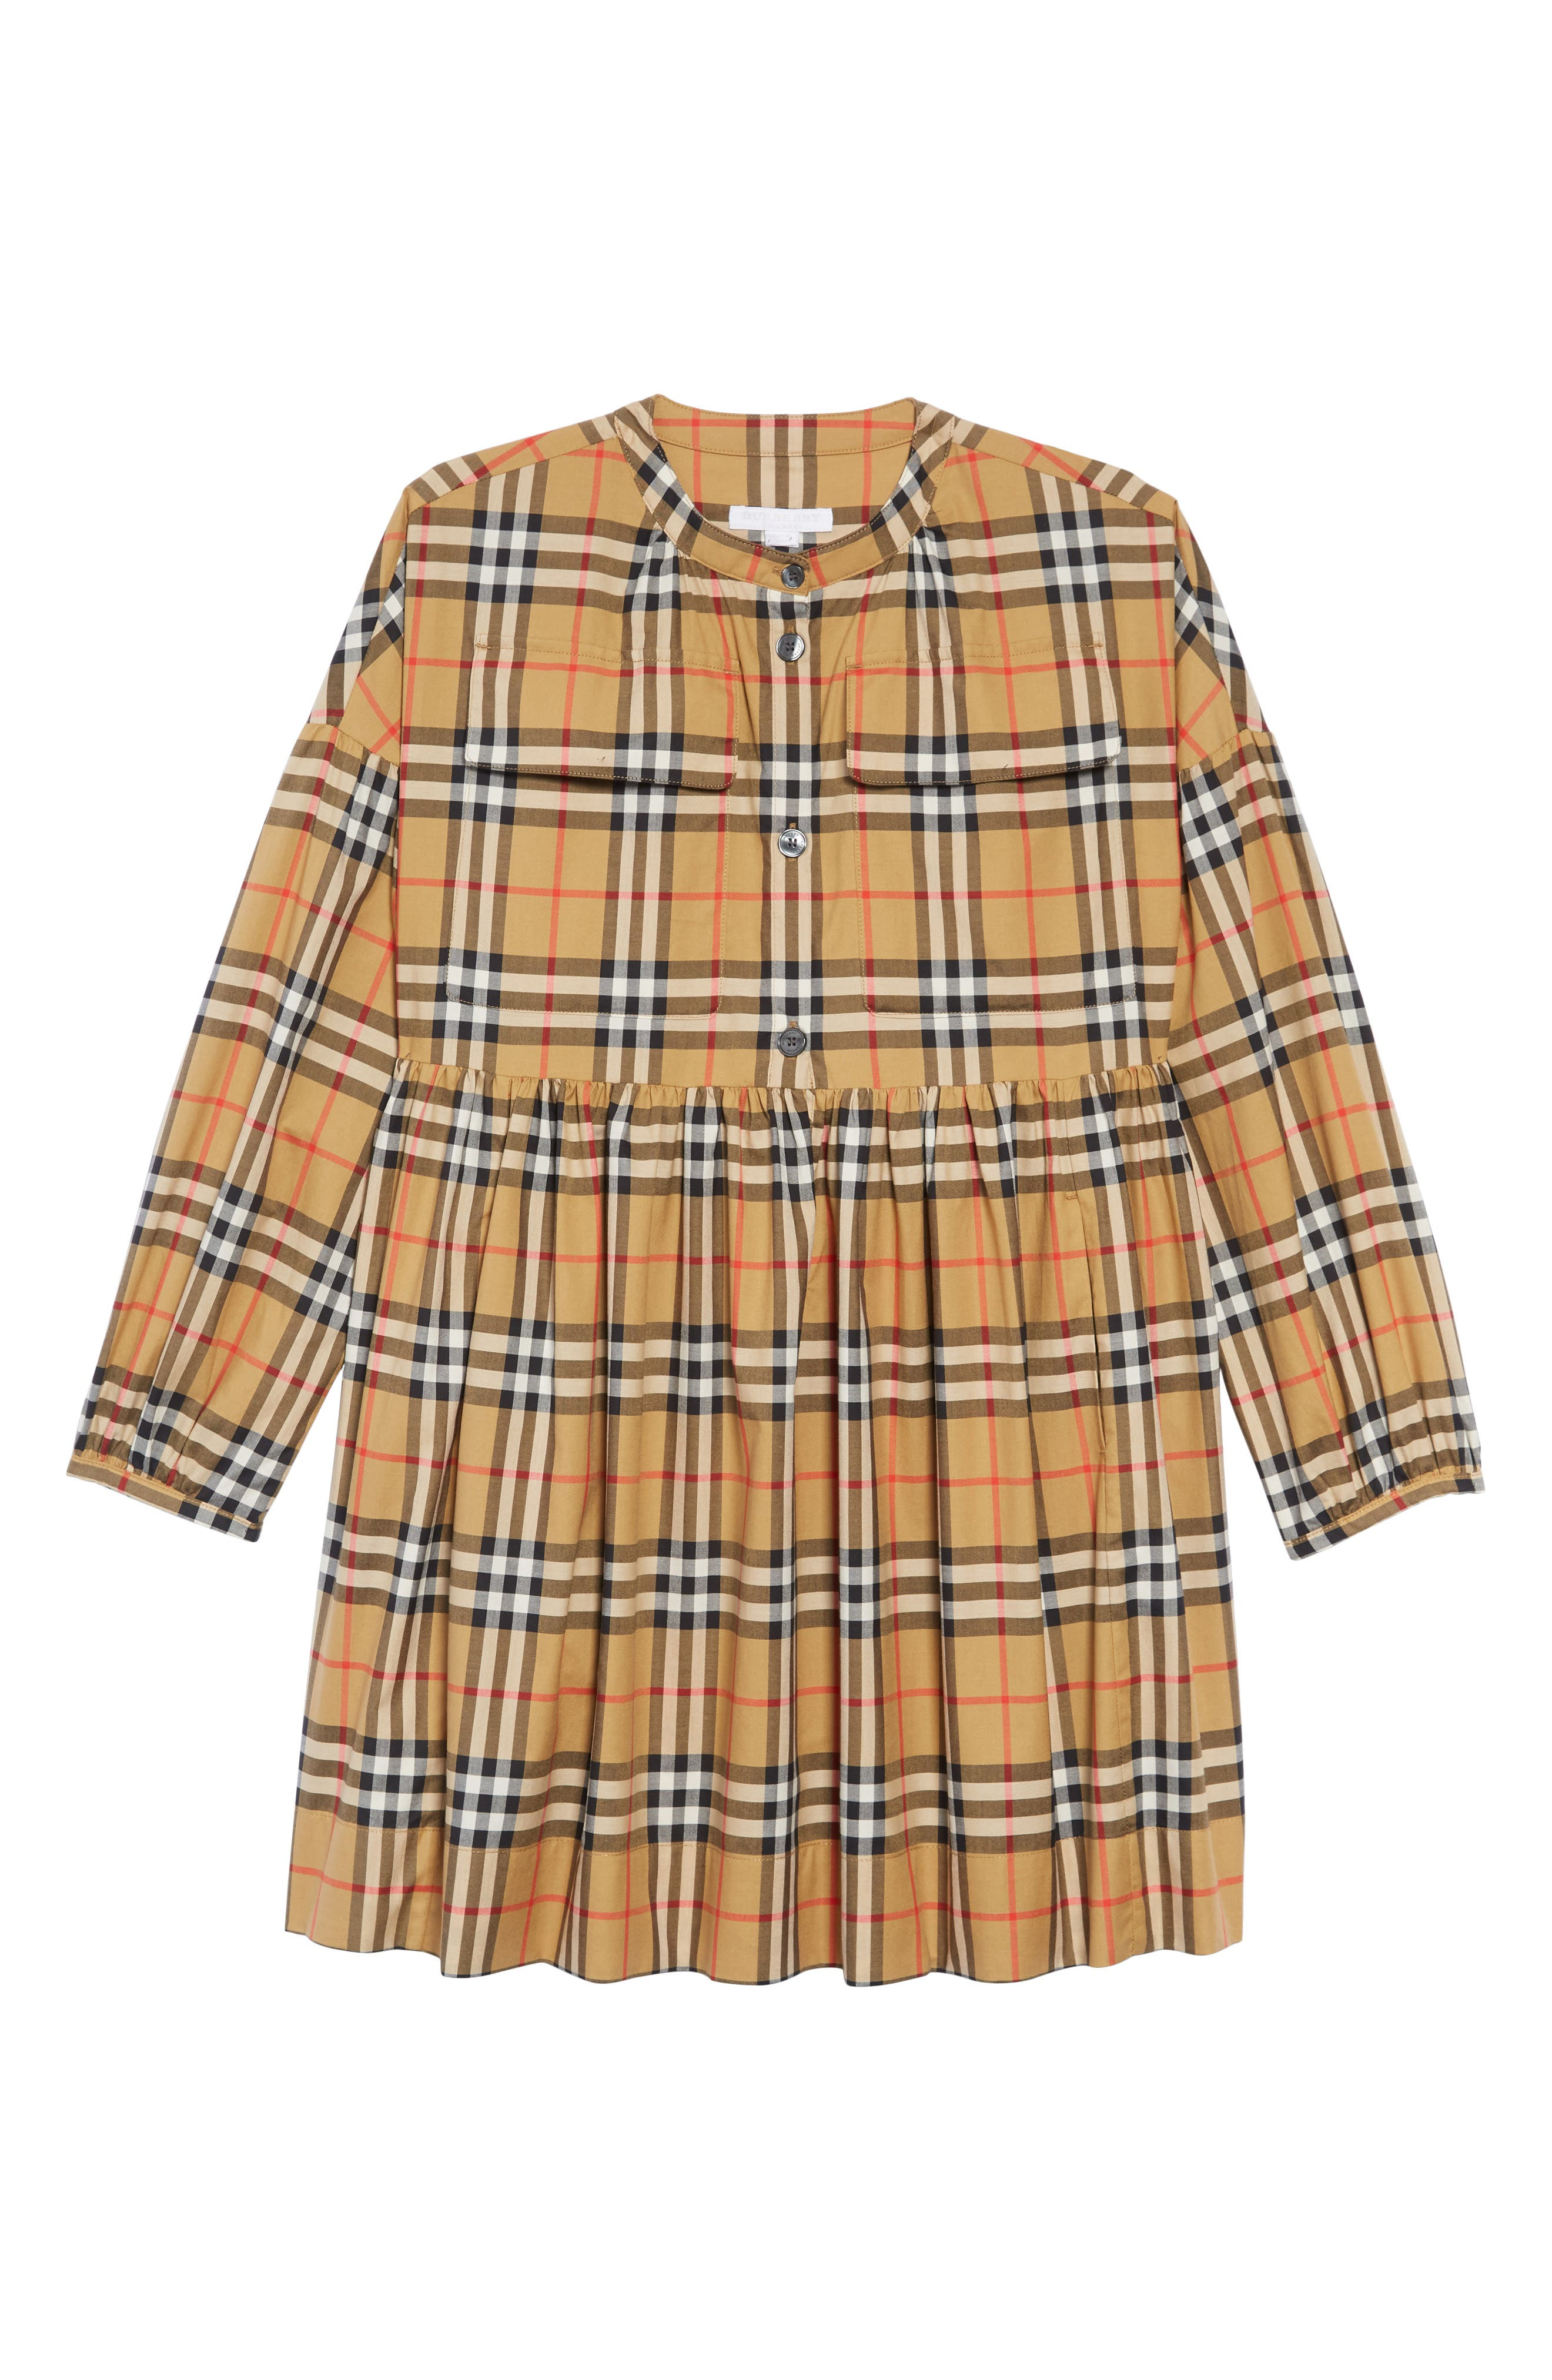 BURBERRY, Marny Dress, Main thumbnail 1, color, ANTIQUE YELLW IP CHK